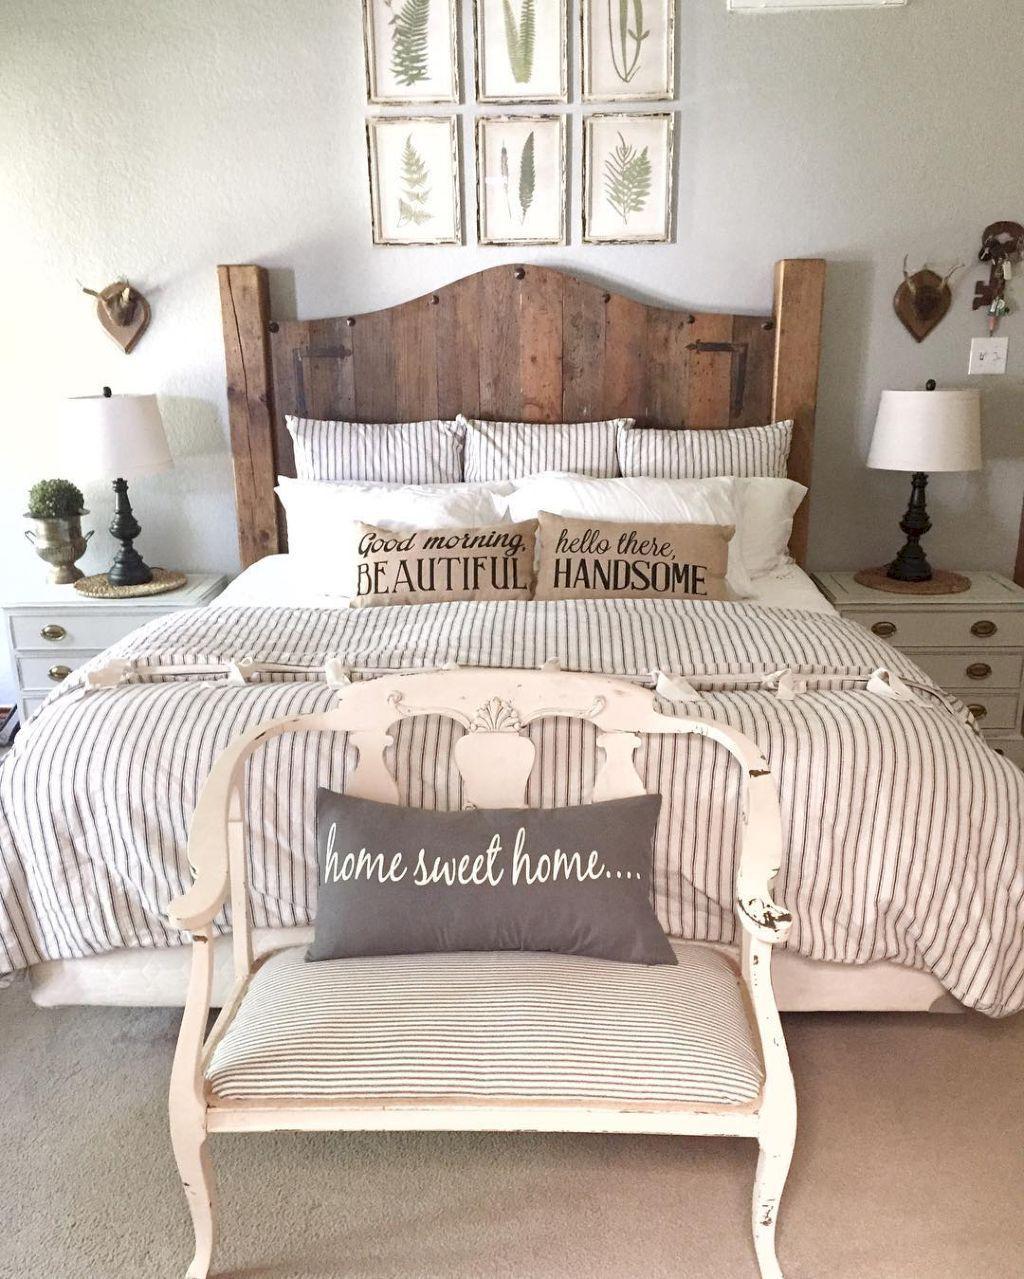 Bedroom decorating master bedroom ideas   Gorgeous Farmhouse Bedroom Decor Ideas  Farmhouse bedroom decor